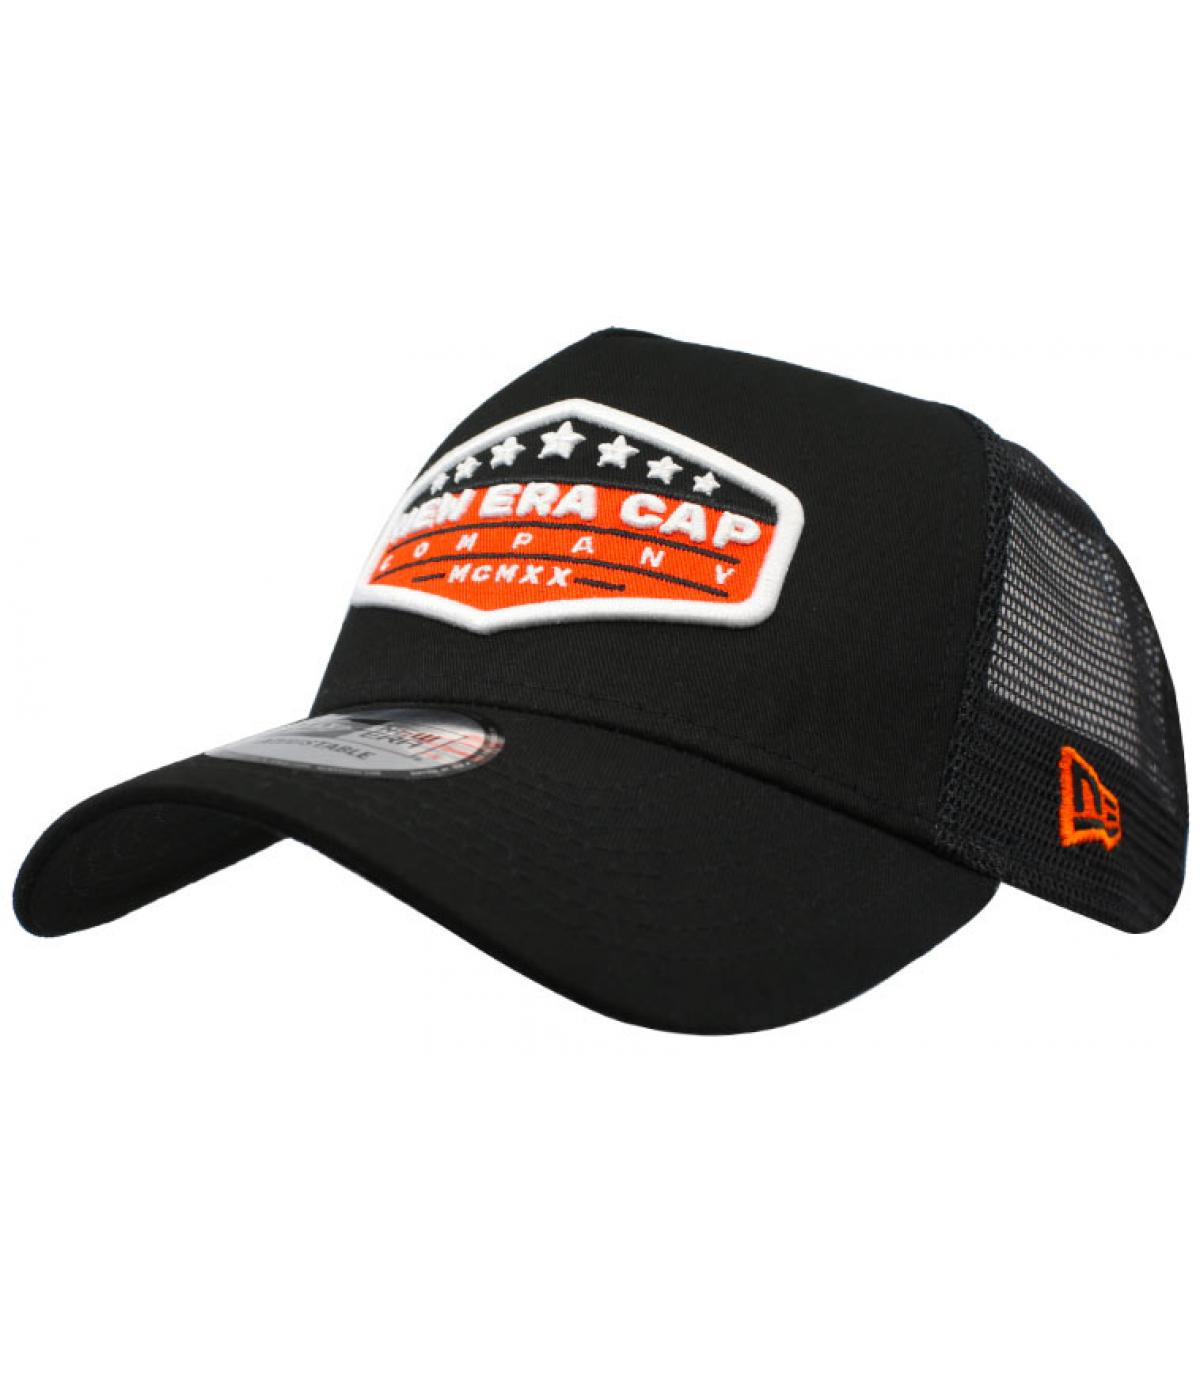 black orange New Era trucker